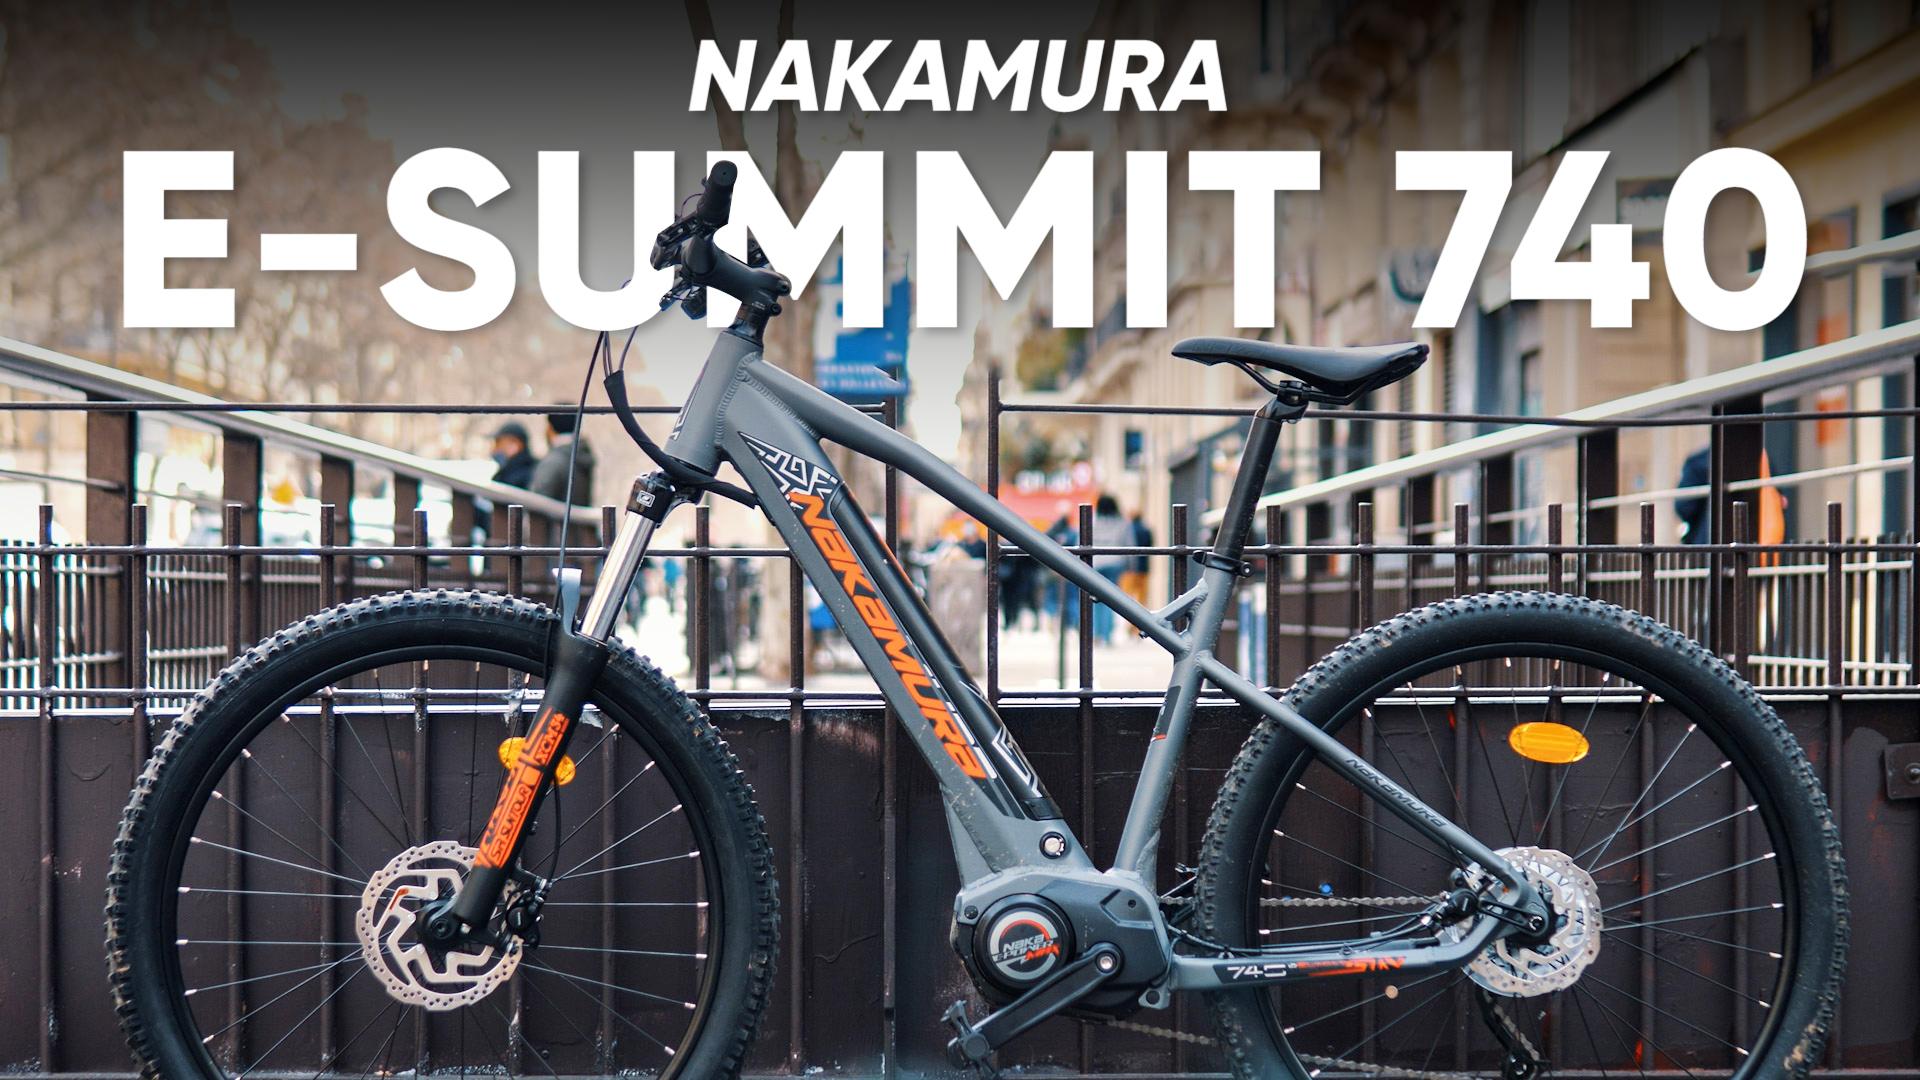 Test du Nakamura E-Summit 740 : un bon VTT s'en sort-il en ville ?